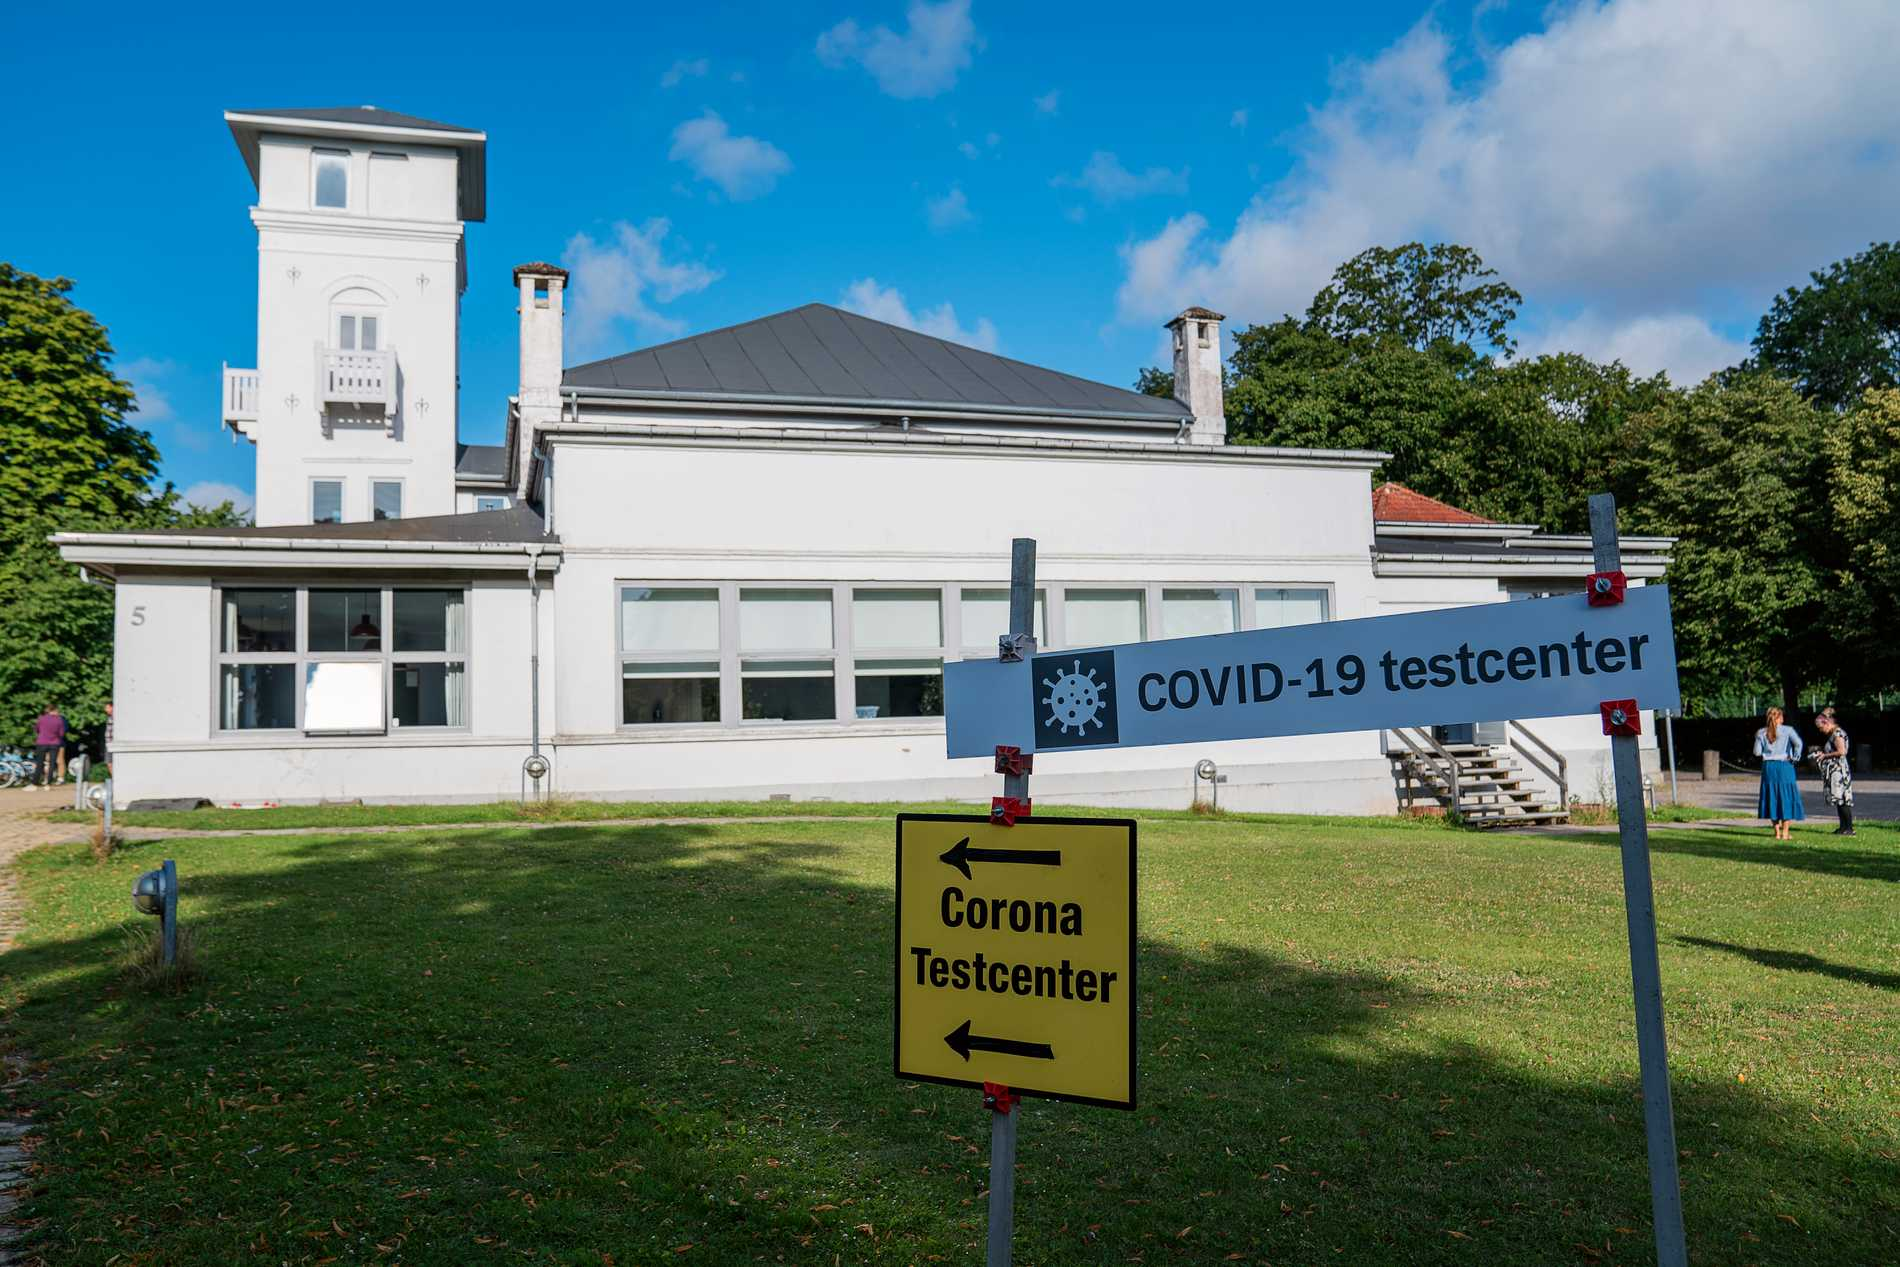 Coronadrabbat slakteri i Danmark slår igen